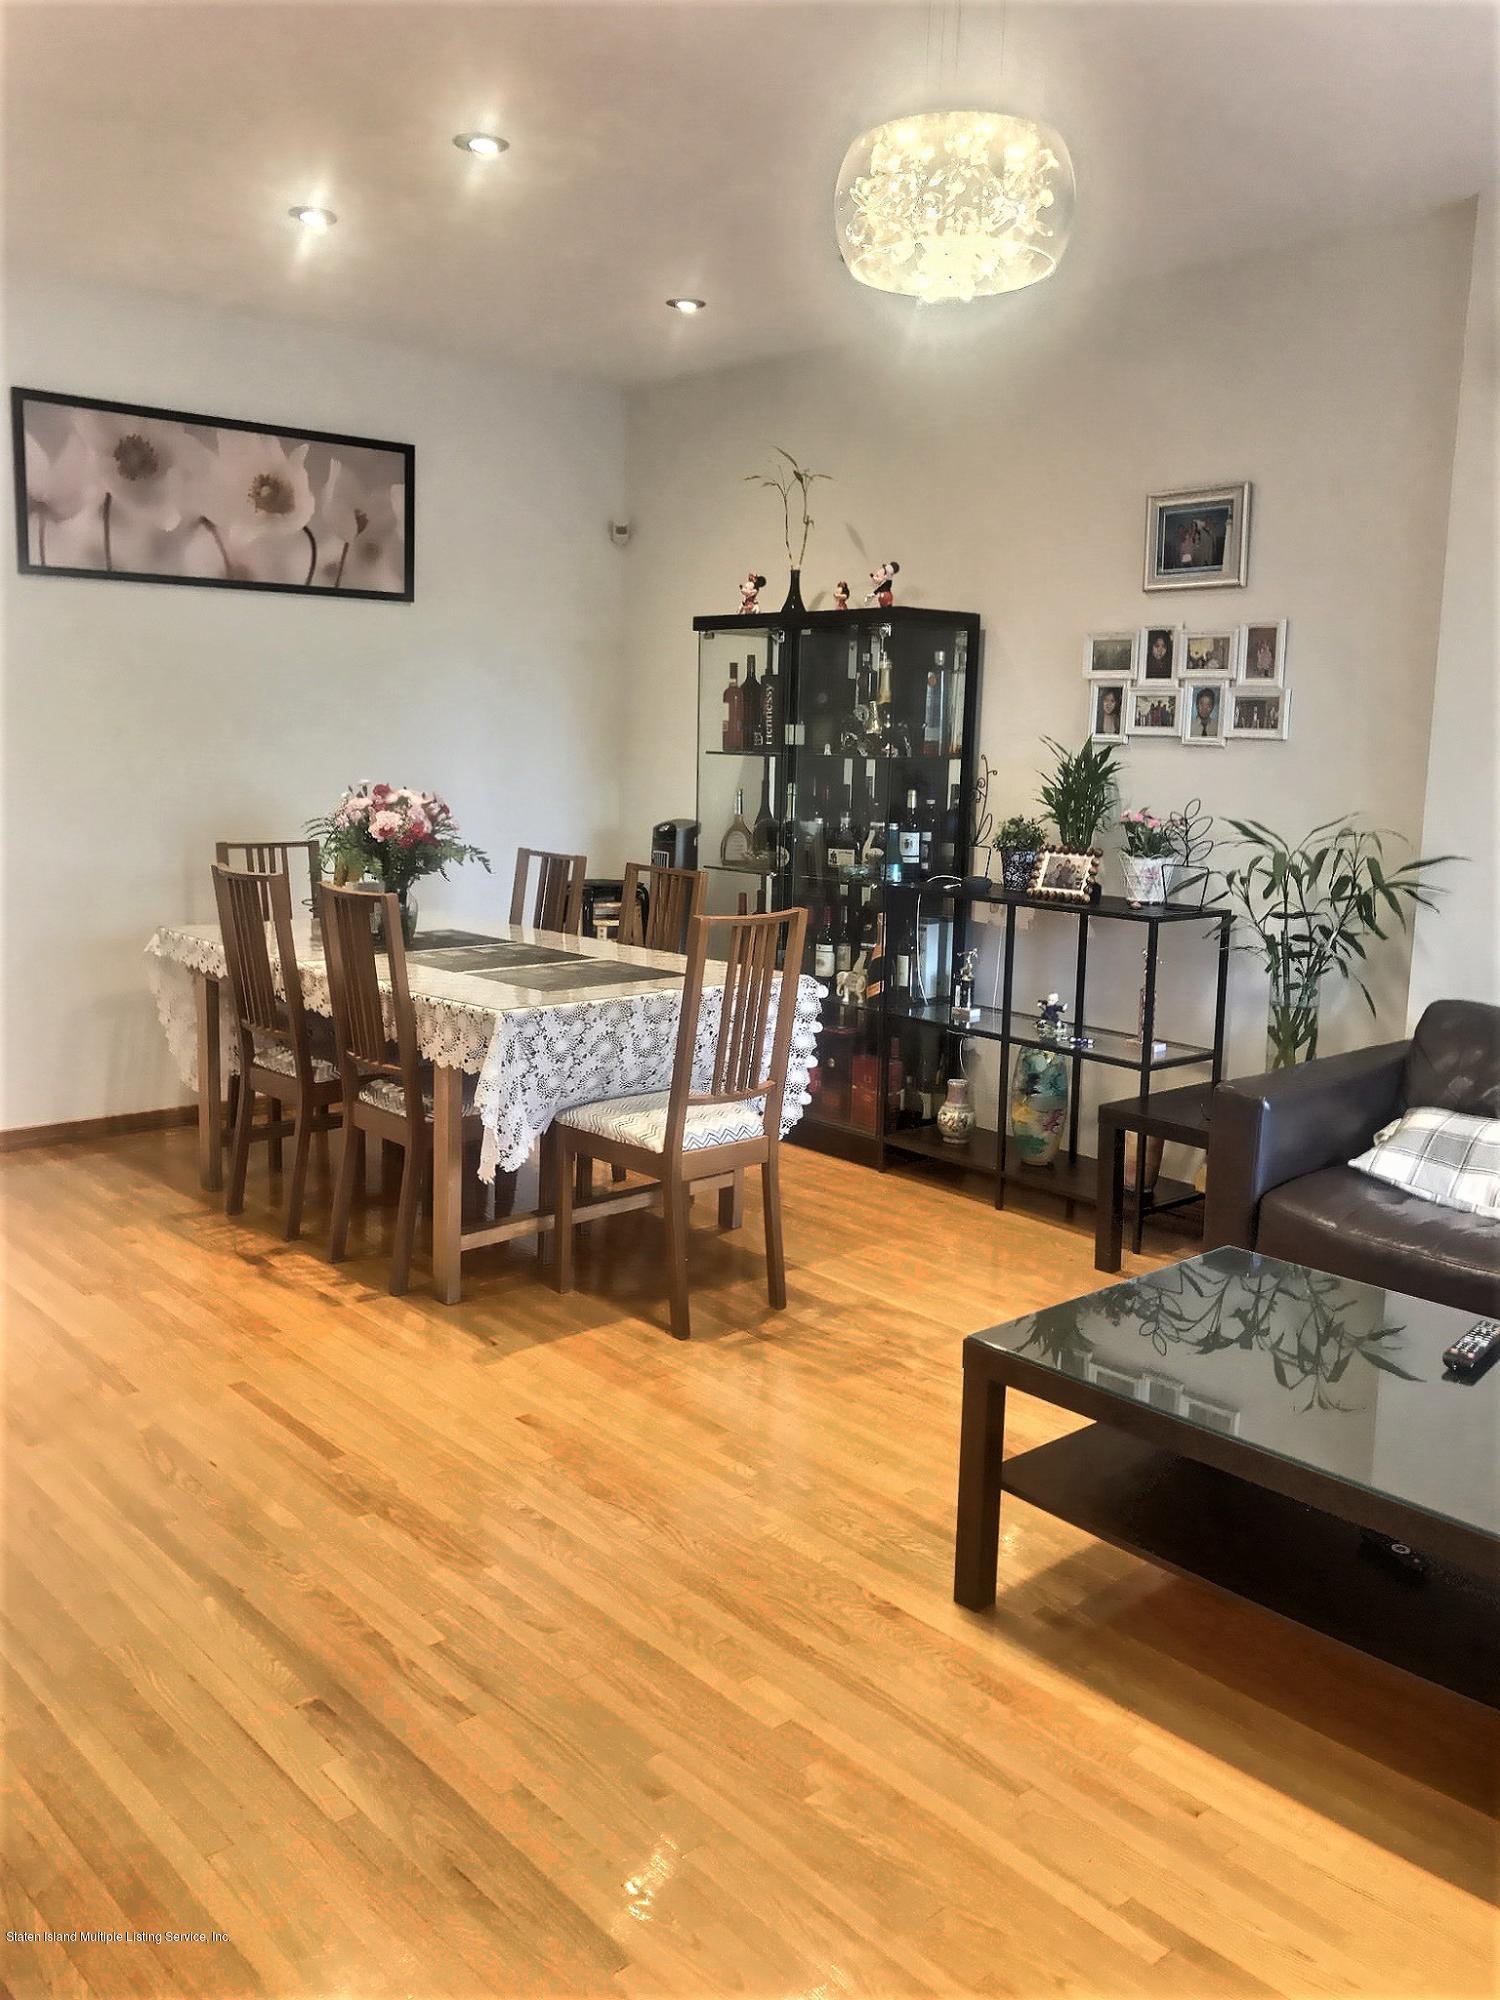 Single Family - Attached 58 Garretson Lane  Staten Island, NY 10304, MLS-1128138-17